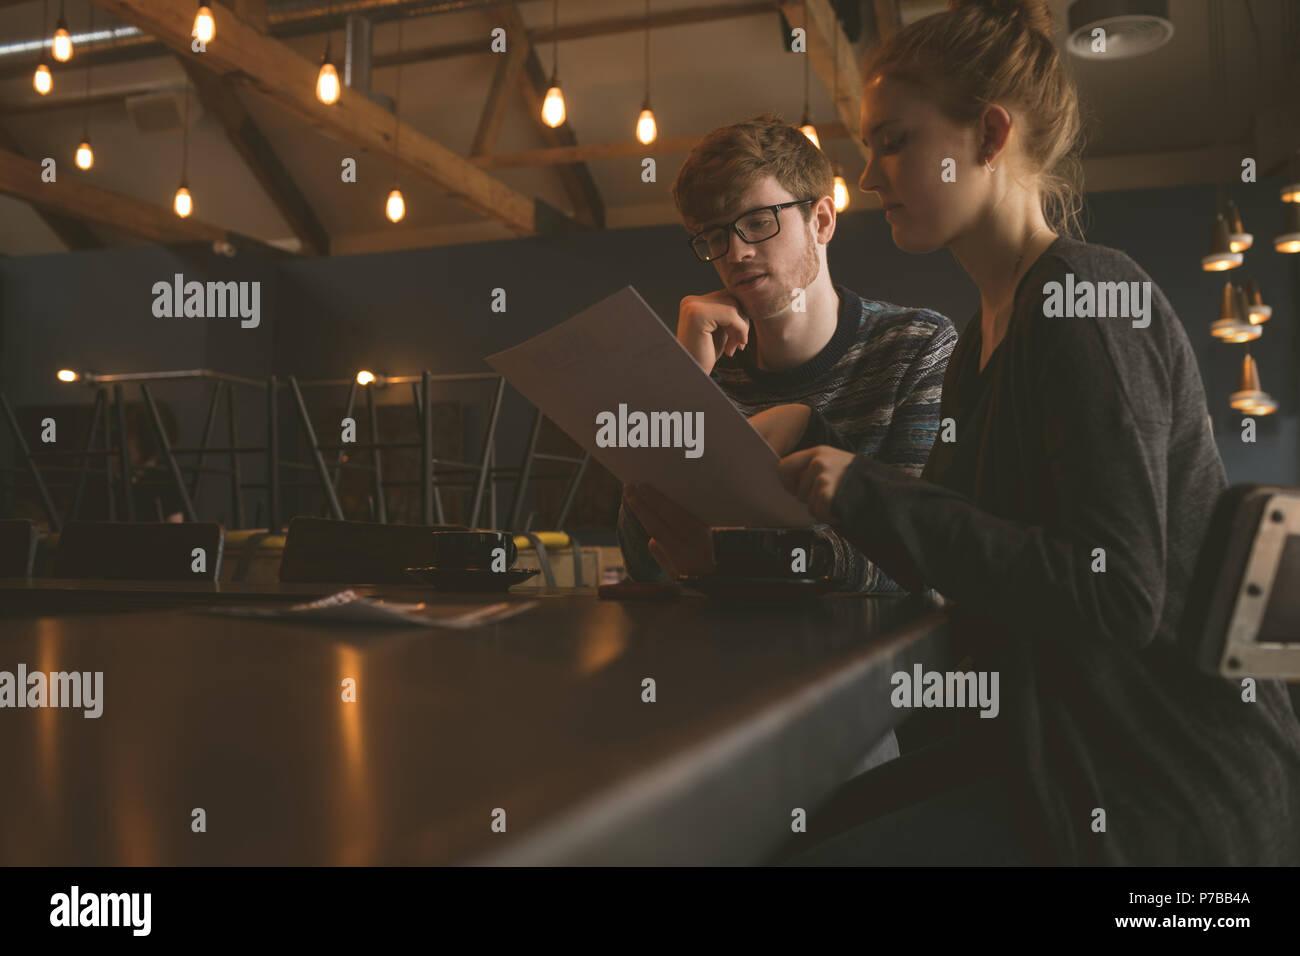 Par controlar la tarjeta del menú en el restaurante Imagen De Stock